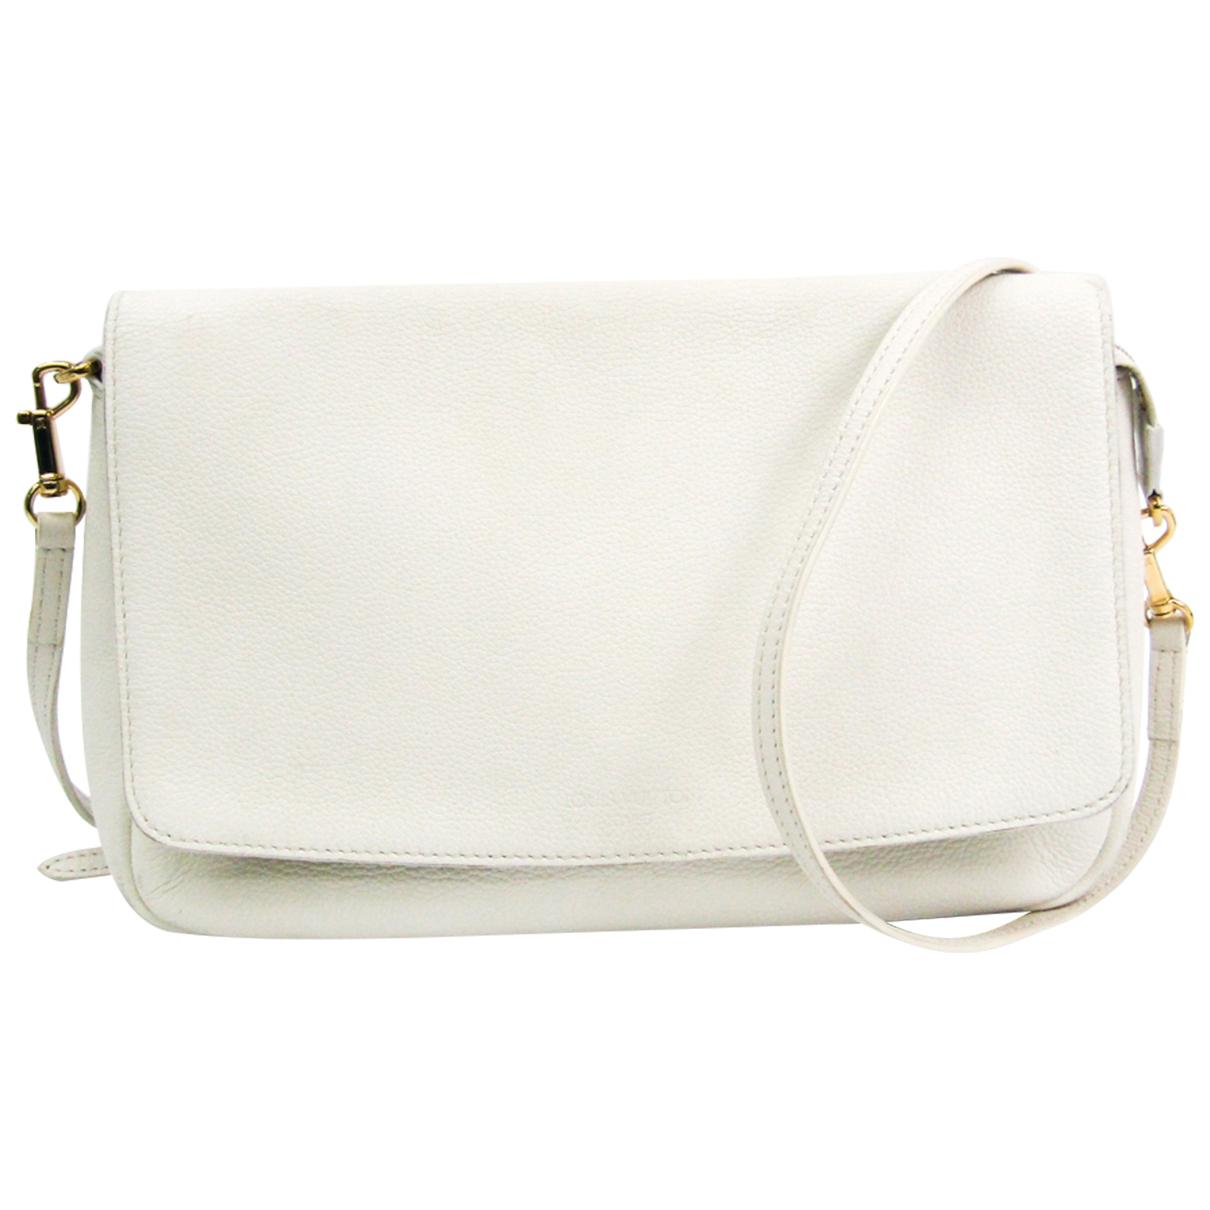 Louis Vuitton - Sac a main   pour femme en cuir - blanc